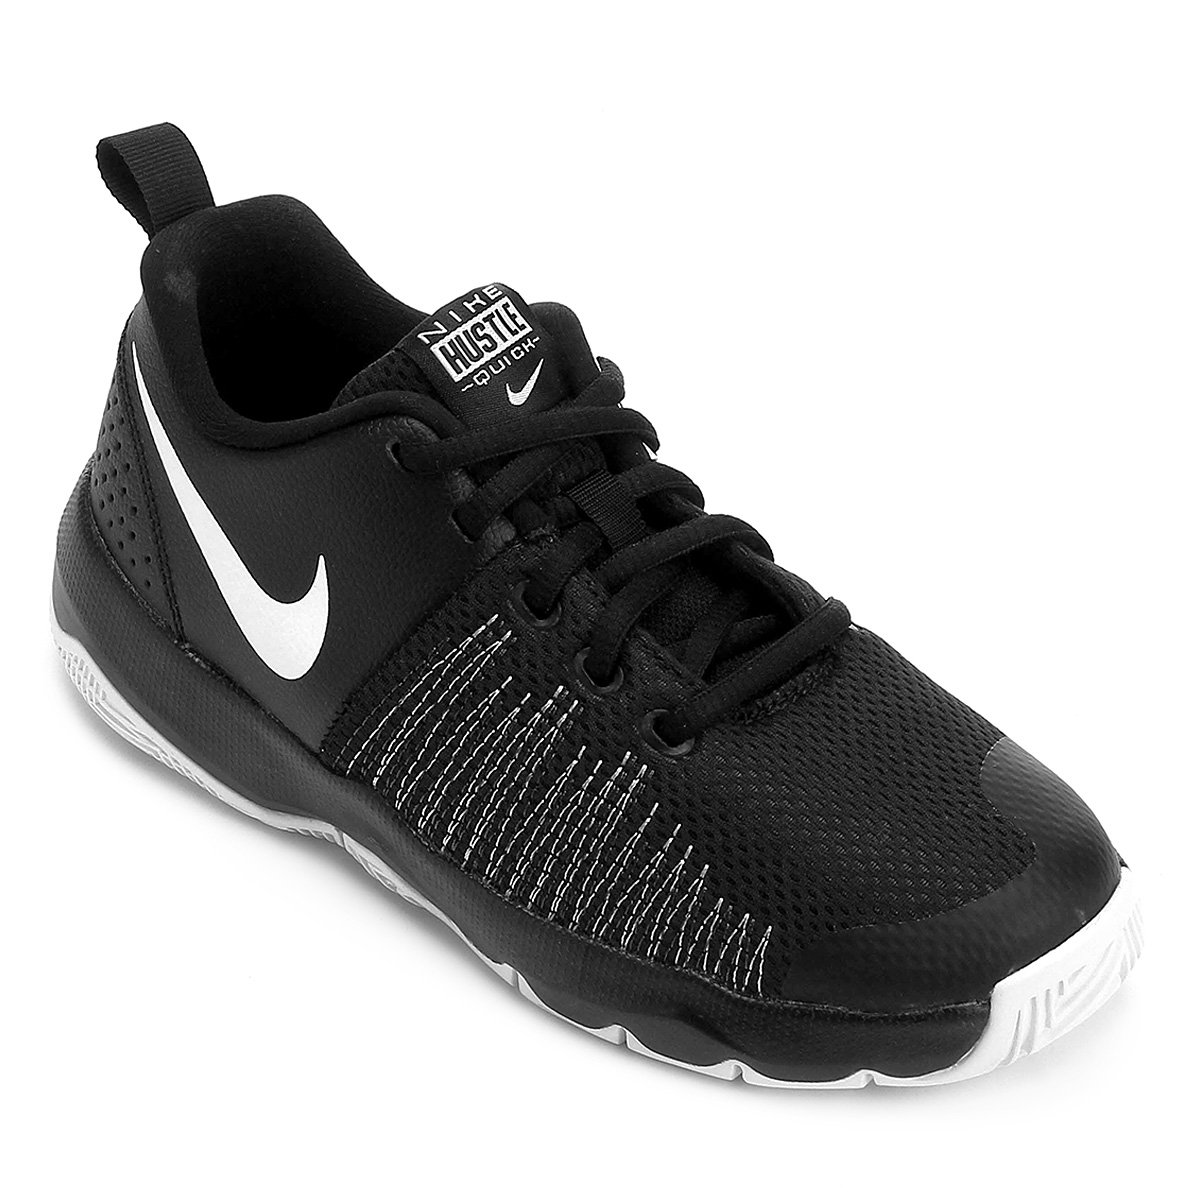 bd0cda49f4 Tênis Infantil Nike Team Hustle Quick Gs Masculino - Compre Agora ...